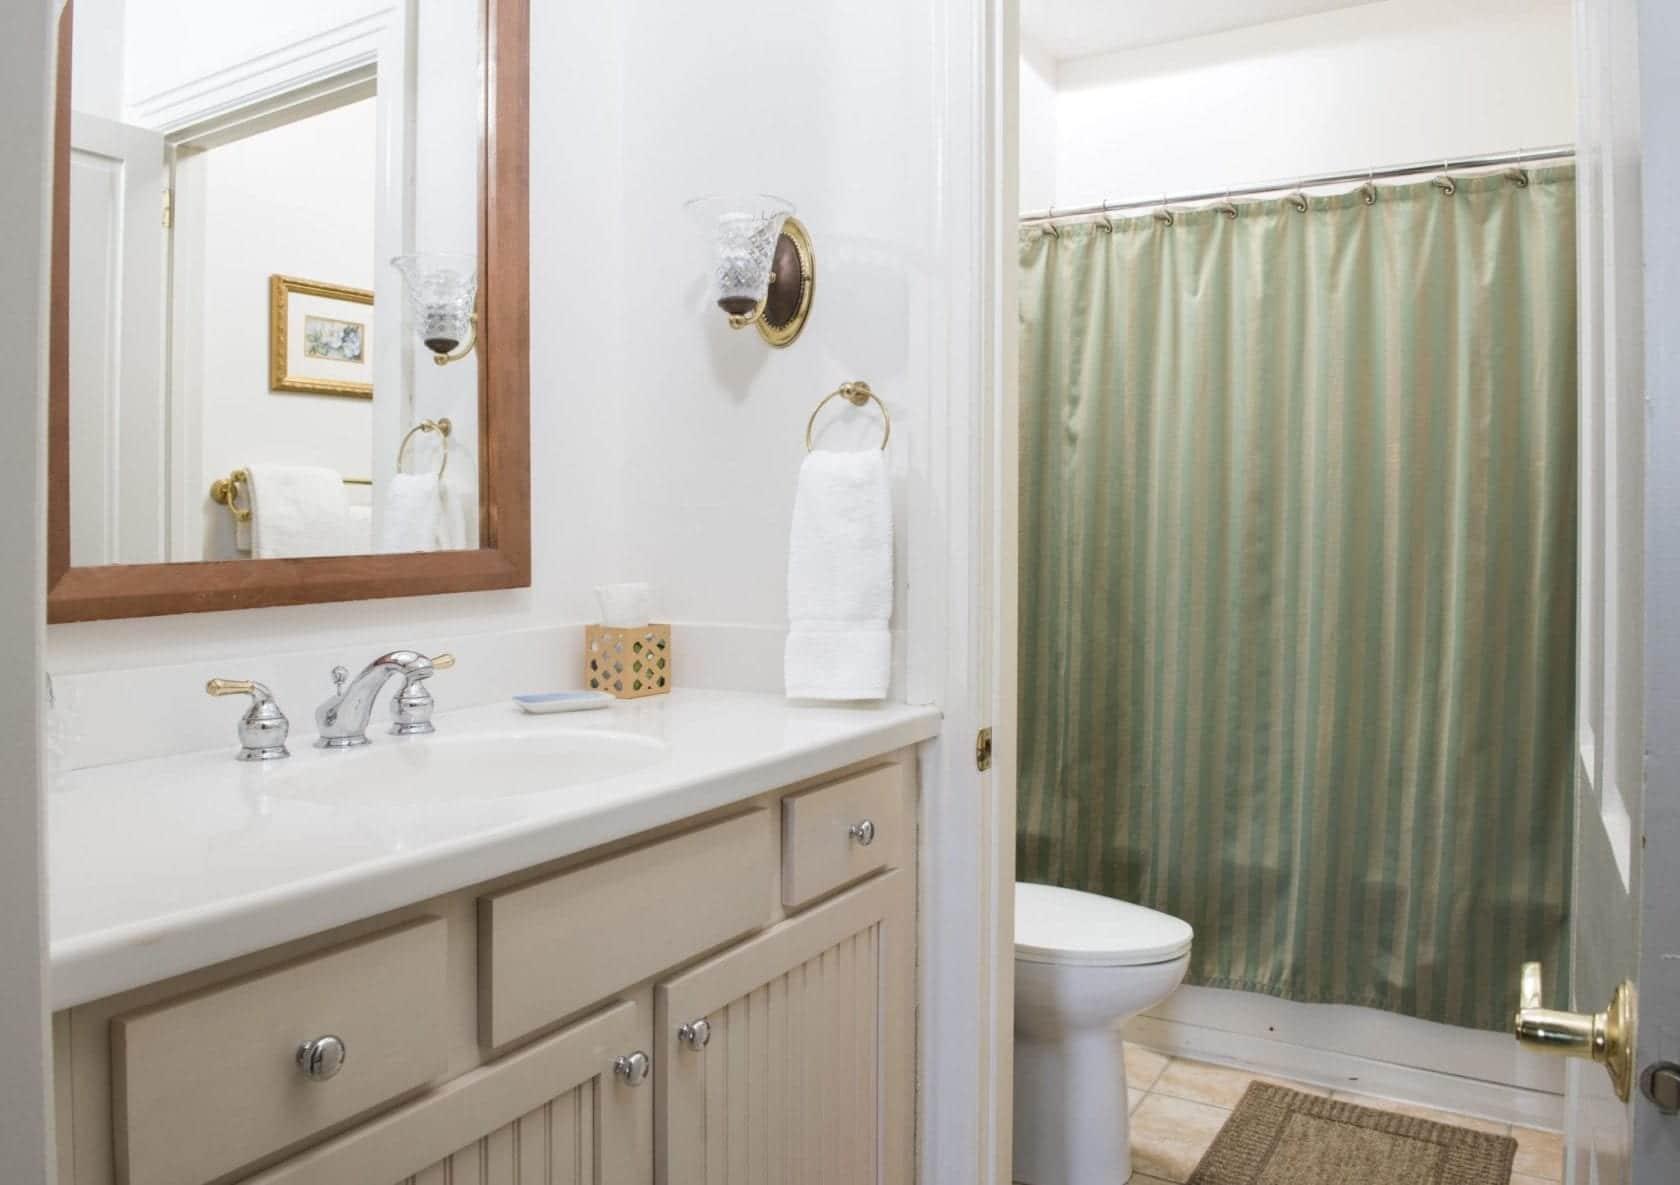 Gibbons Bathroom